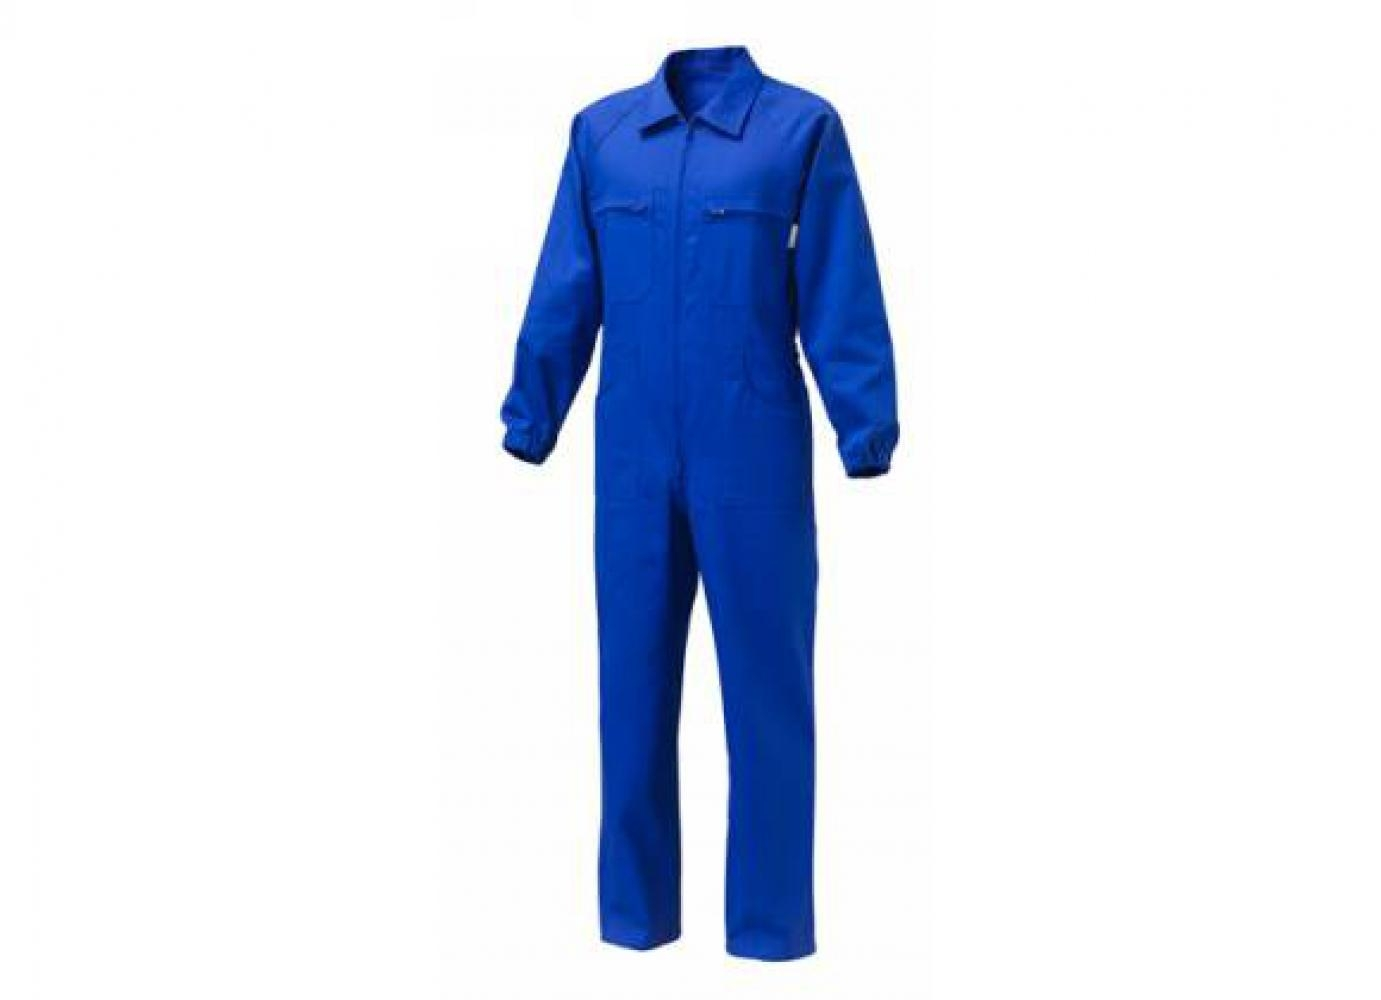 Acquista Tuta New Renopol-cot Bluette Tg 17545810 | Glooke.com